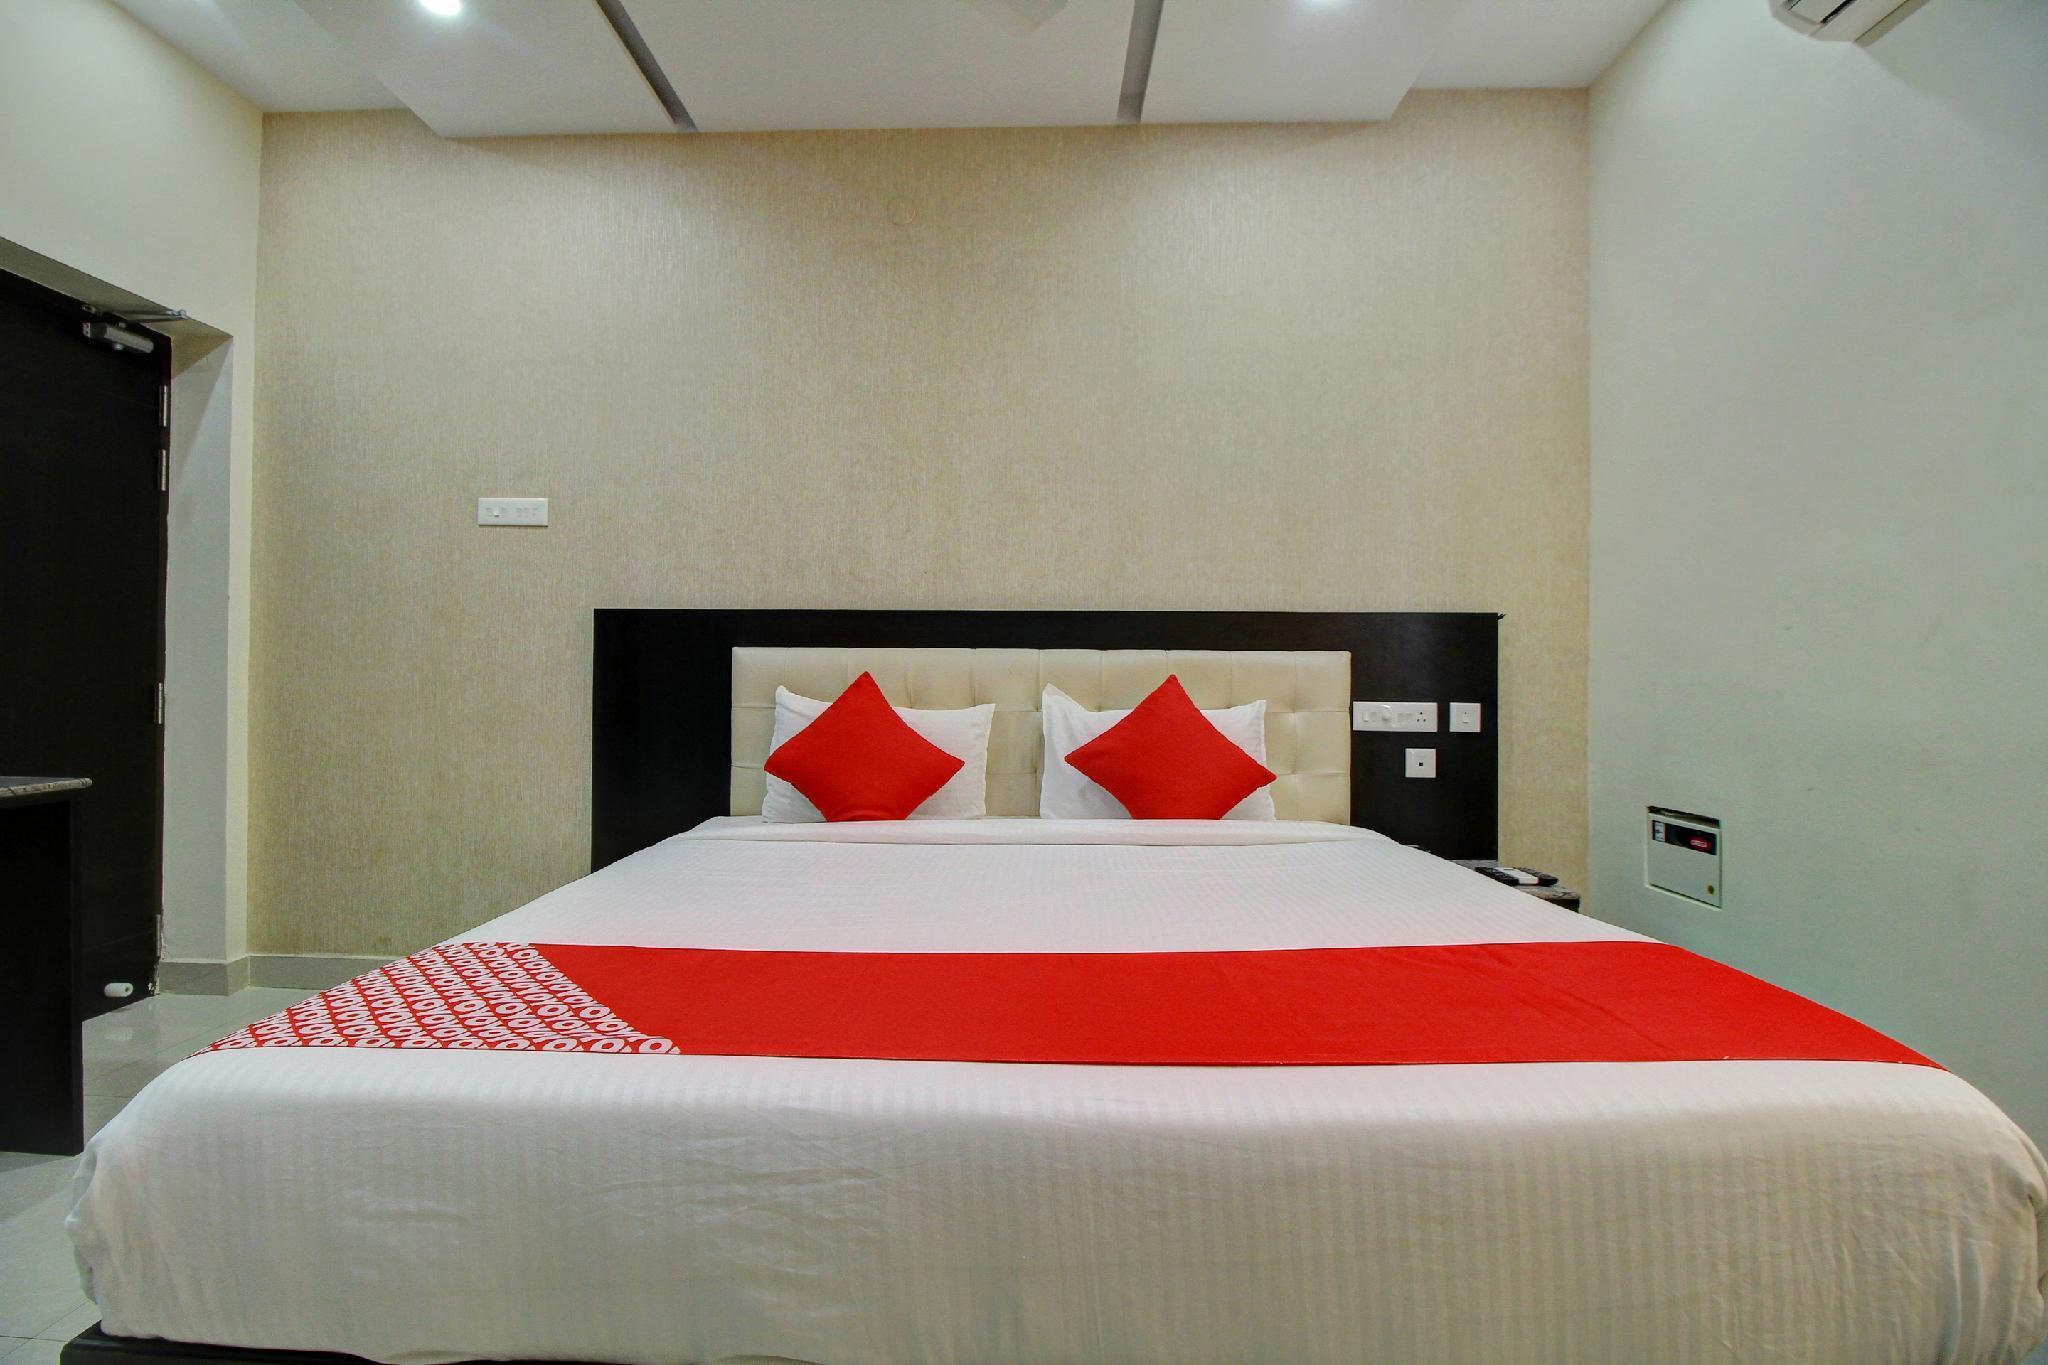 Capital O 7191 Shri Subham Residency